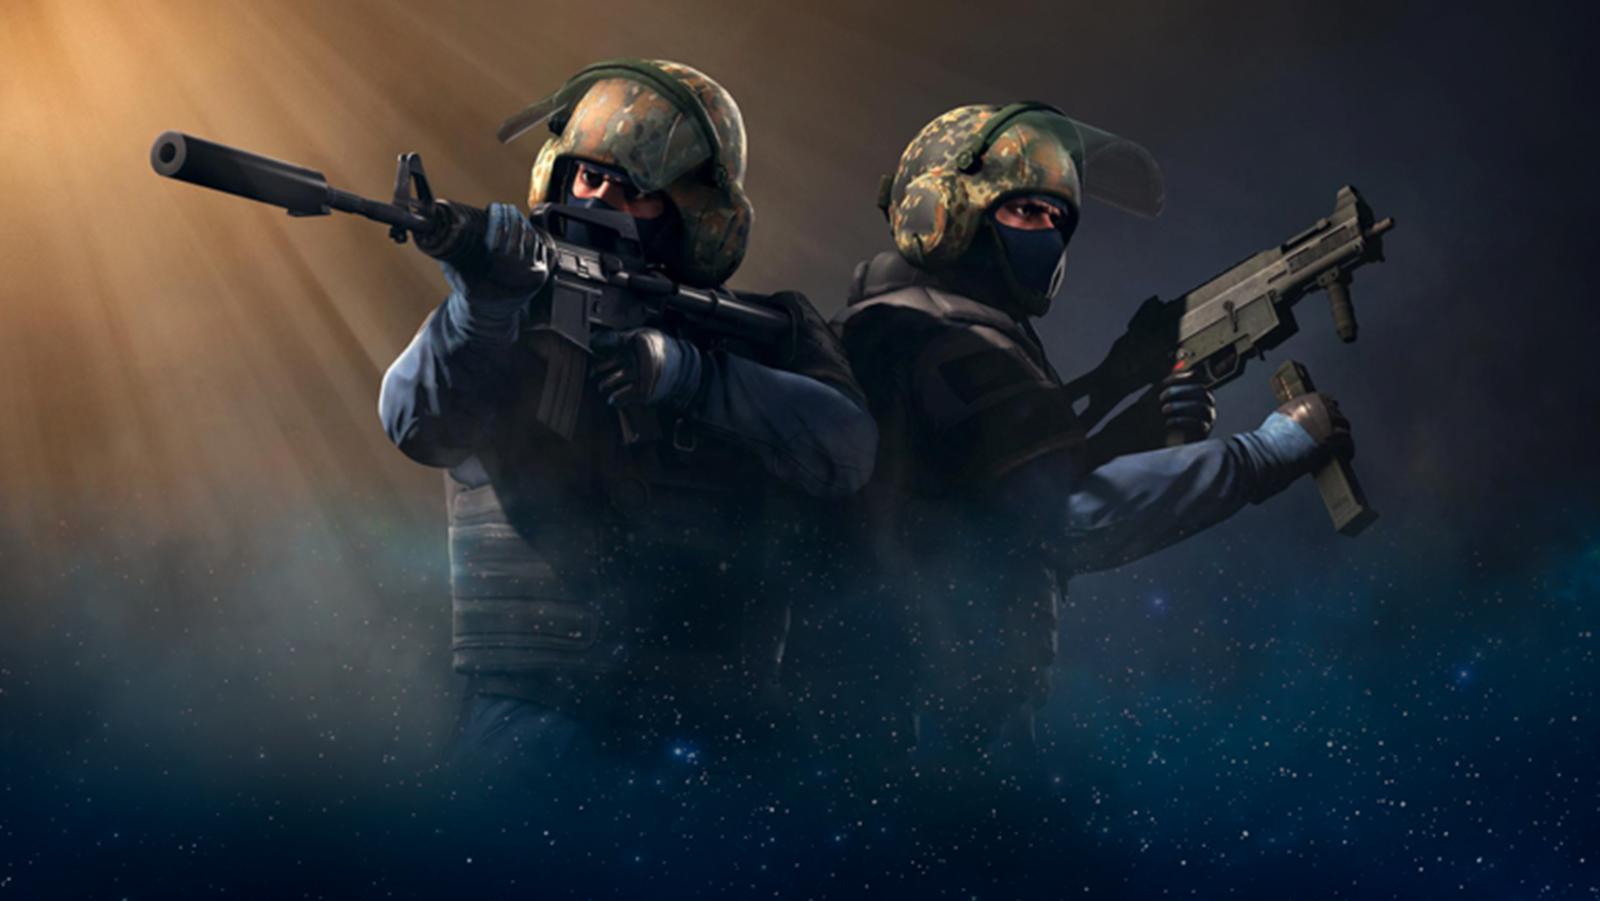 Unser neues CS:GO Team